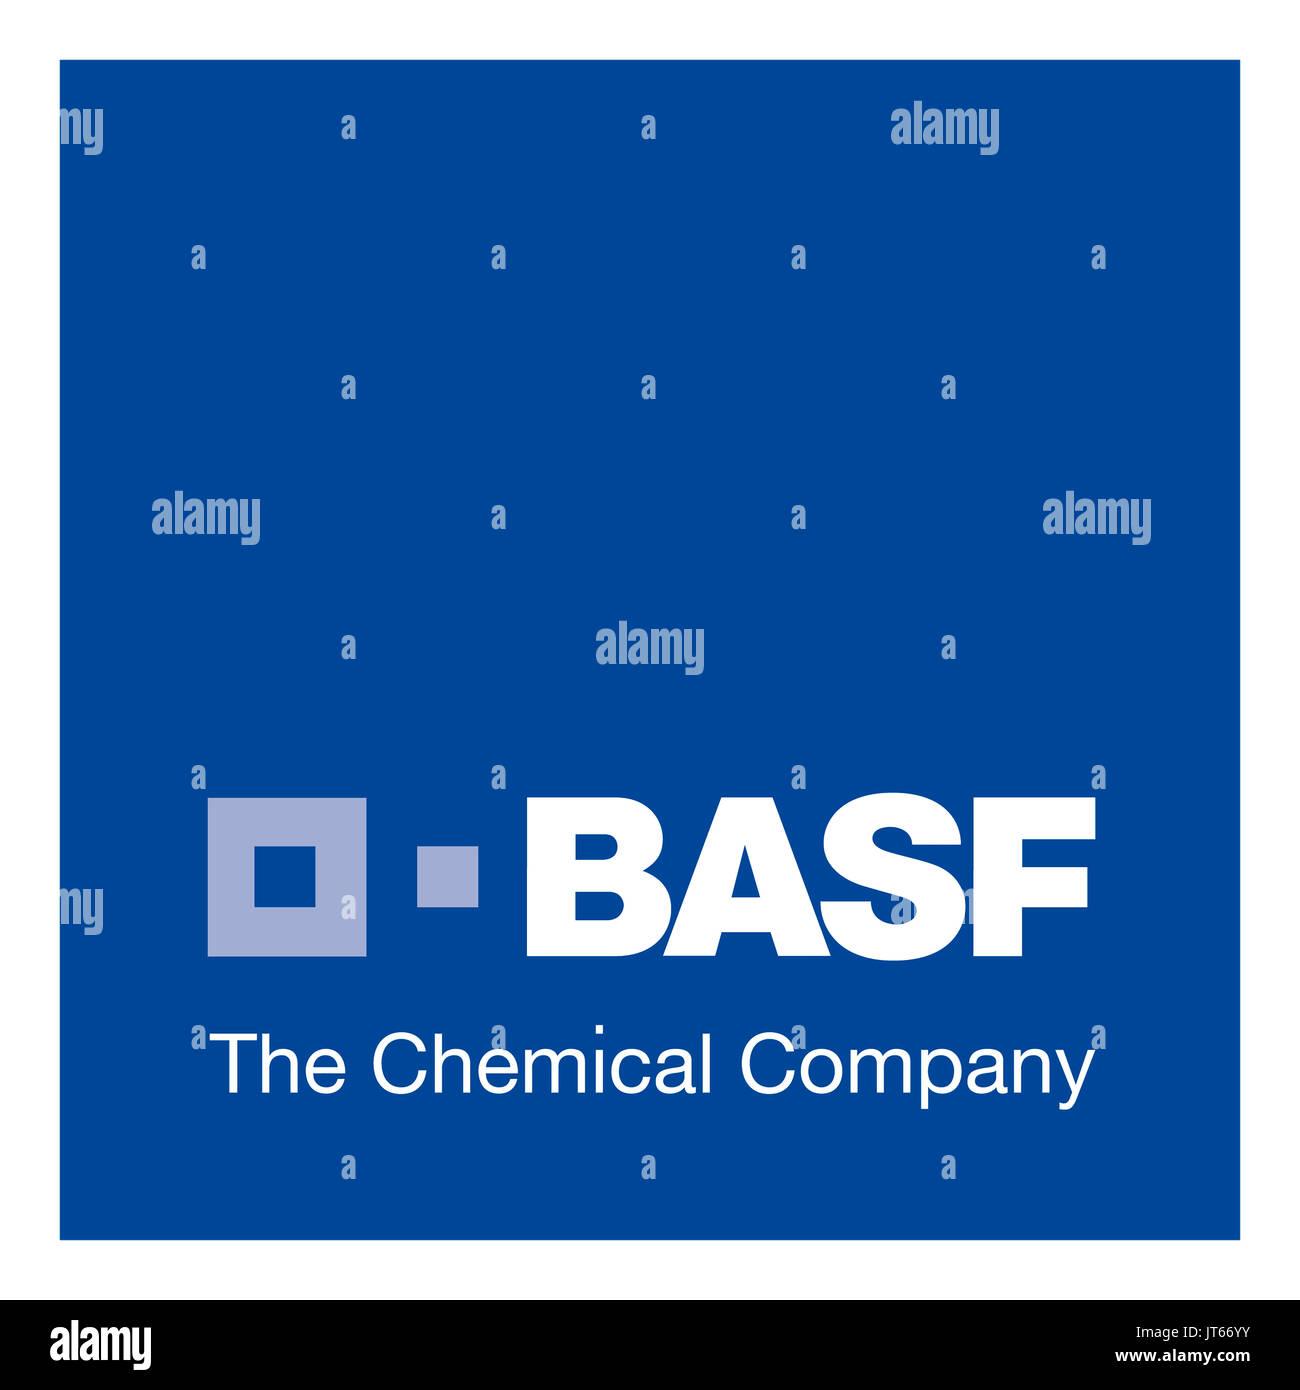 BASF The Chemical Company, German chemical company, company logo, DAX 30 companies - Stock Image